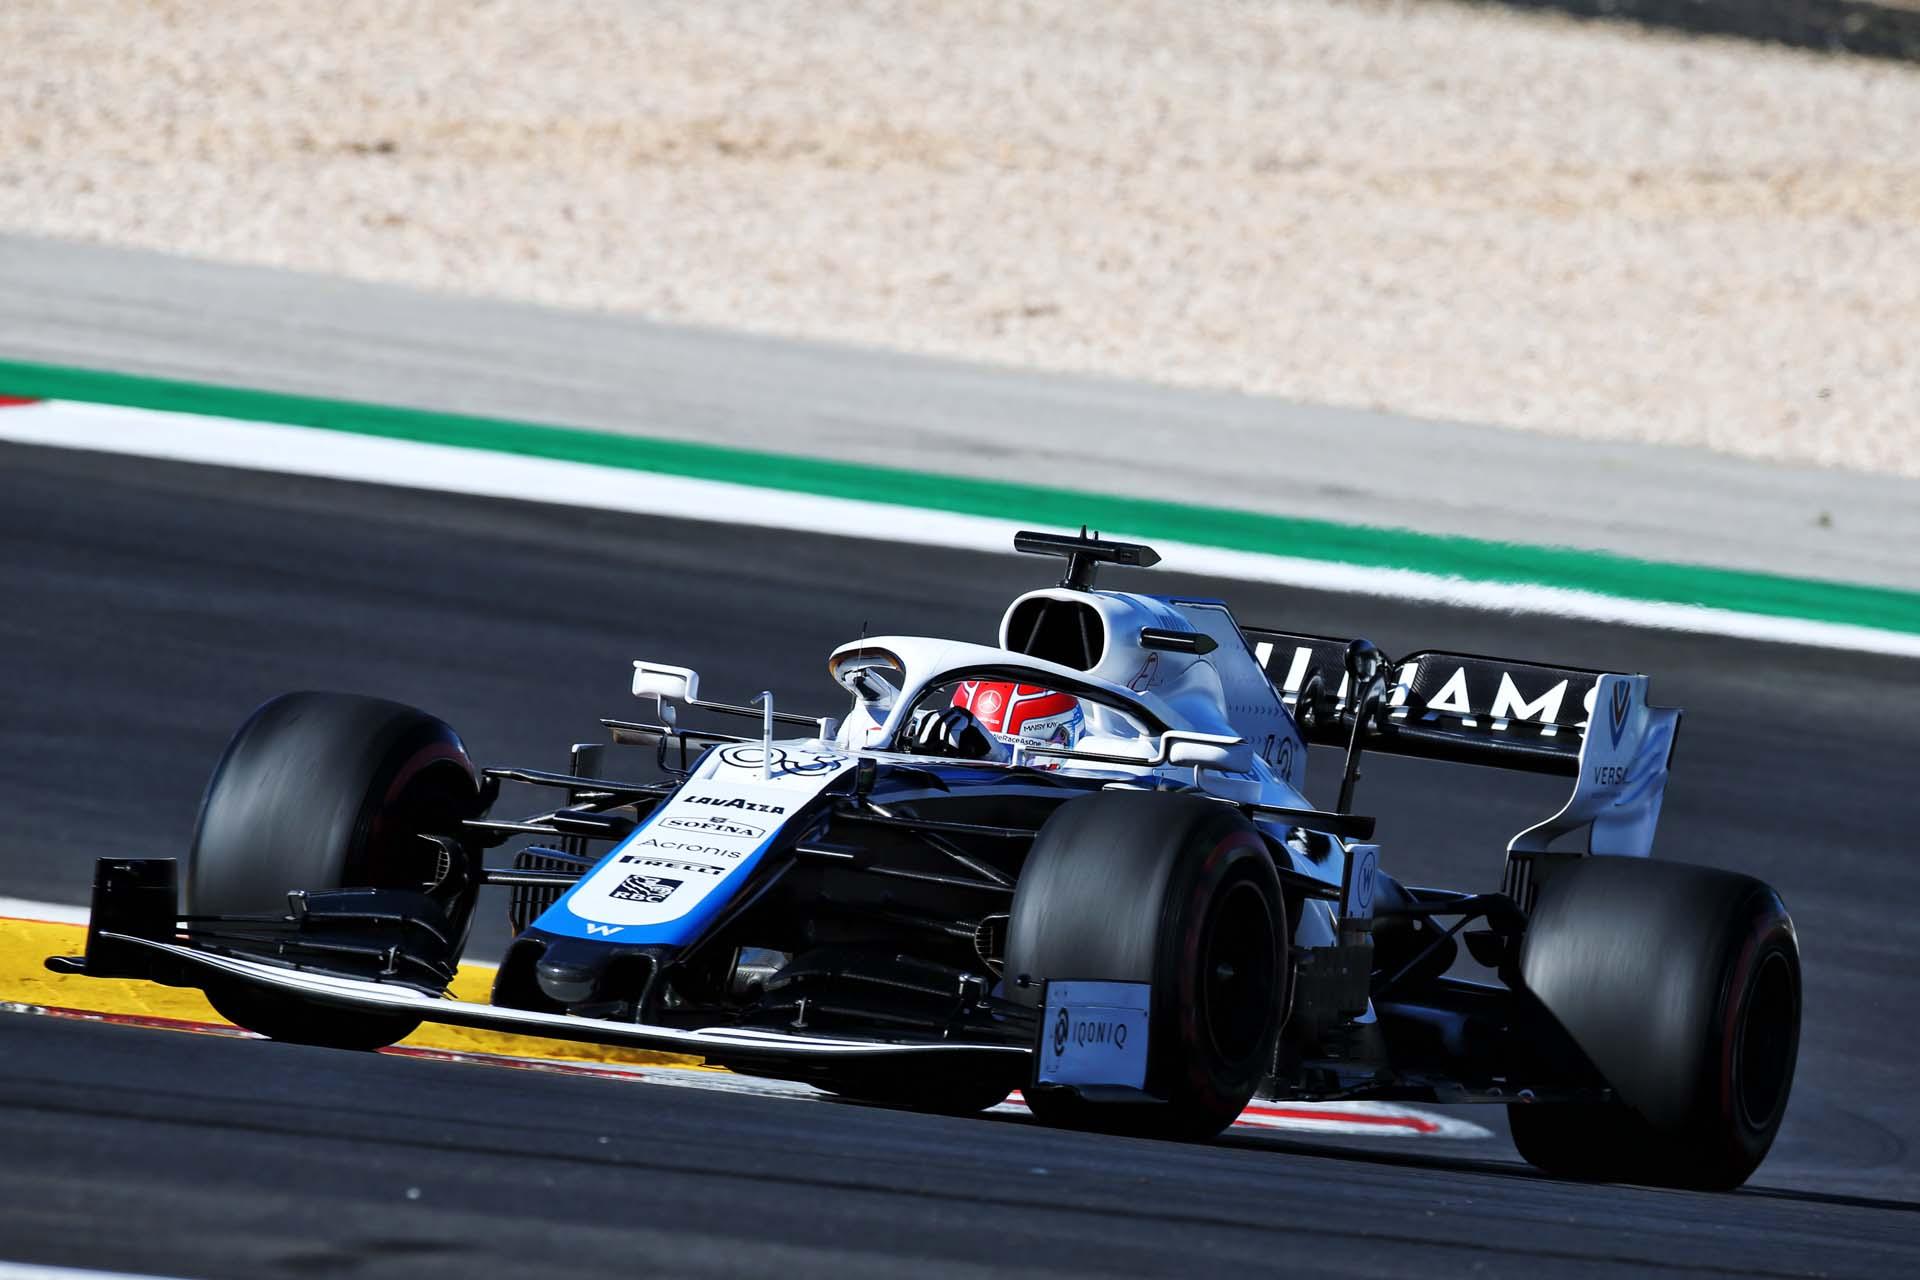 Motor Racing - Formula One World Championship - Portuguese Grand Prix - Qualifying Day - Portimao, Portugal